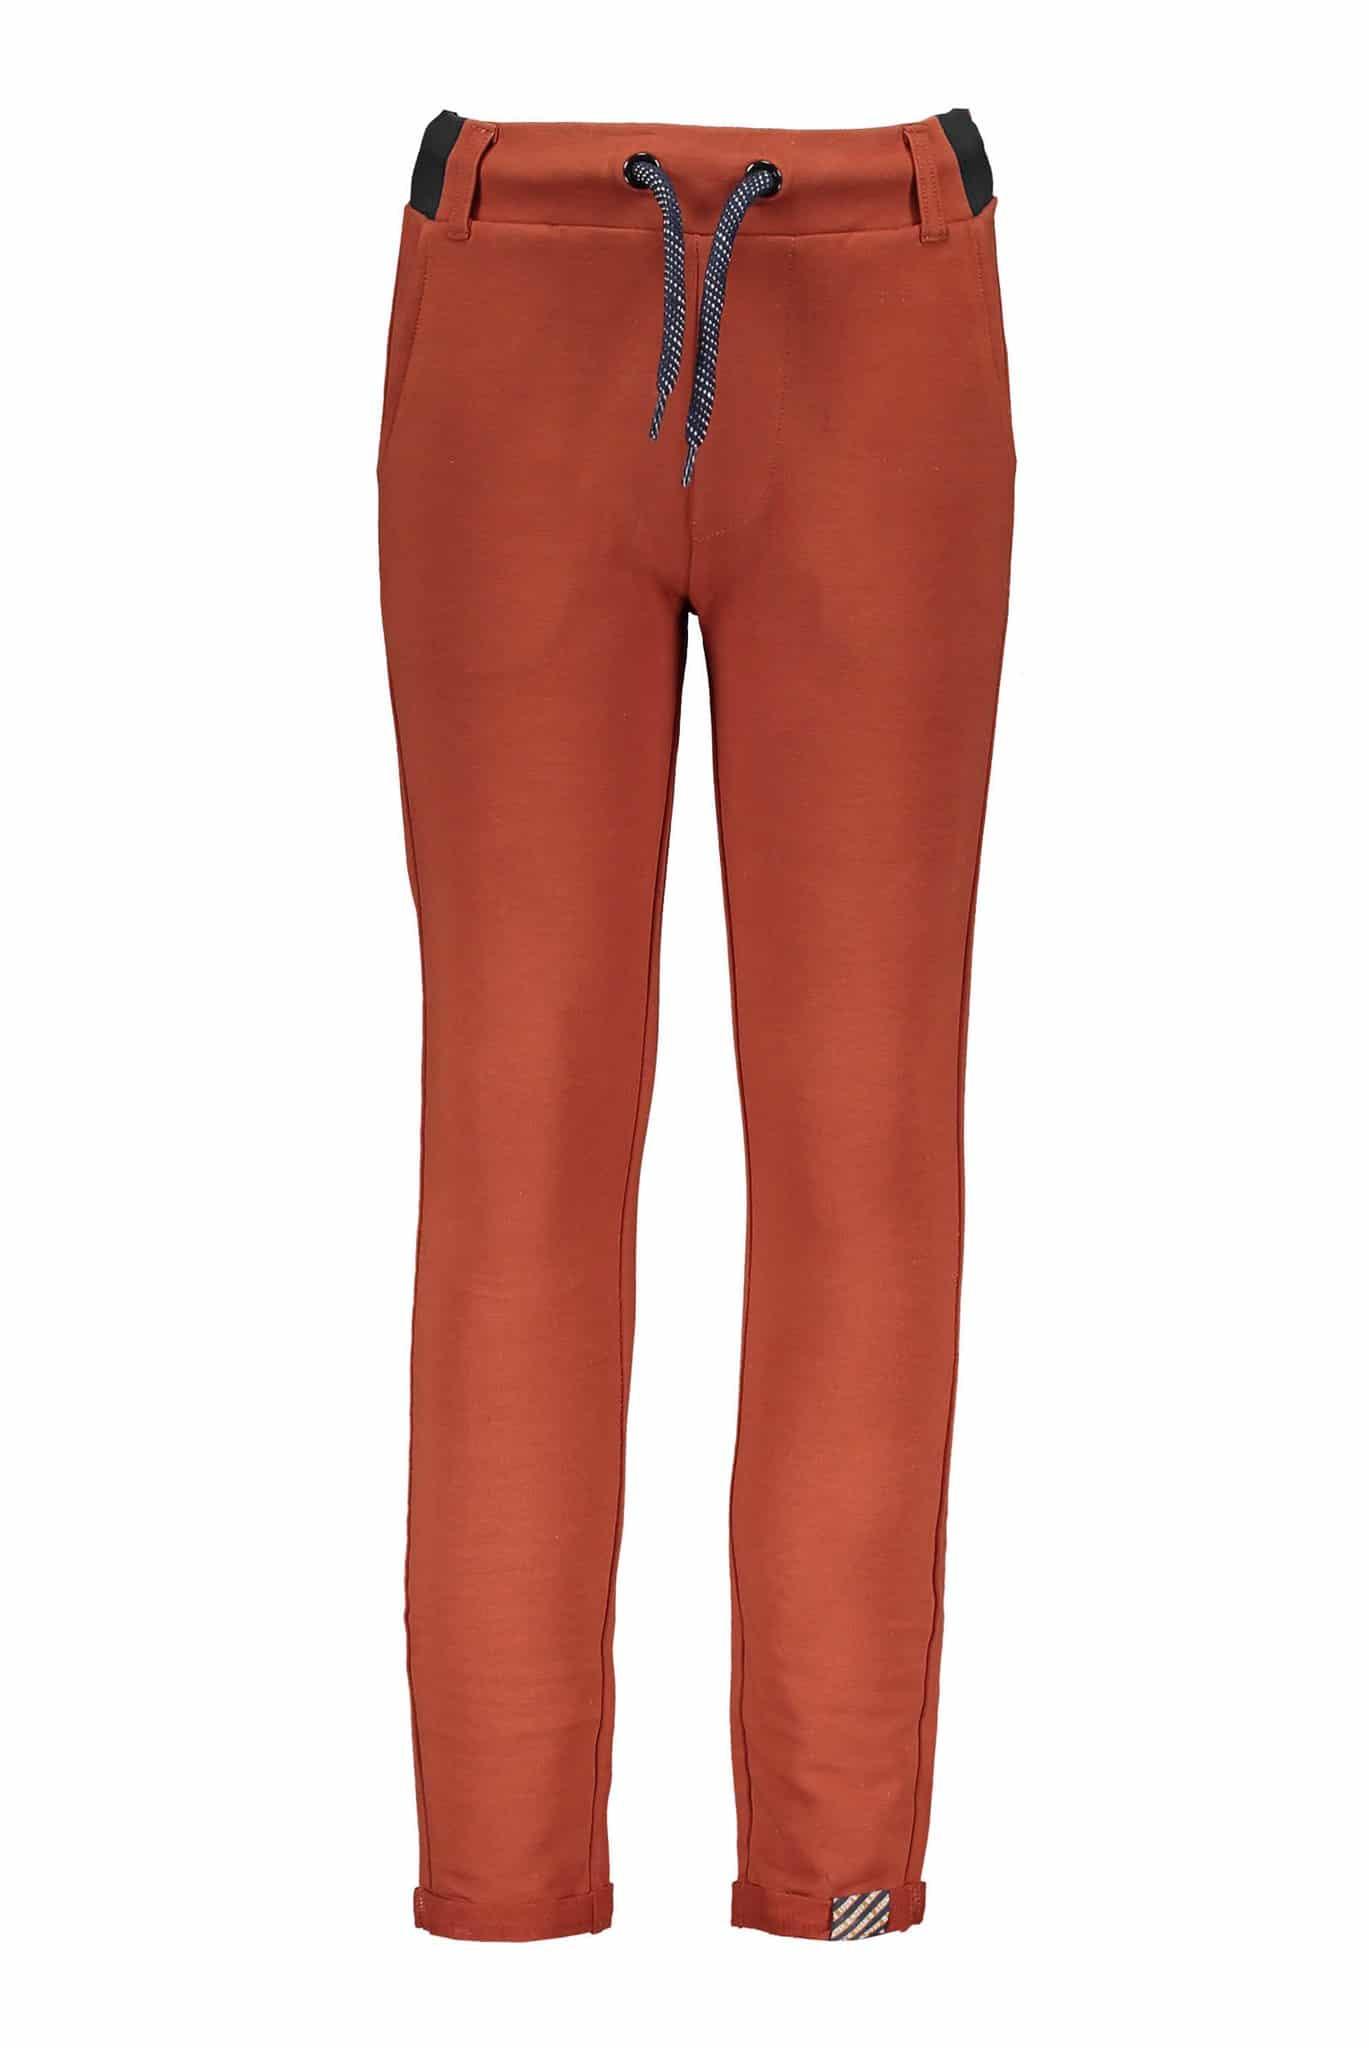 B.NOSY Boys Sweat pants